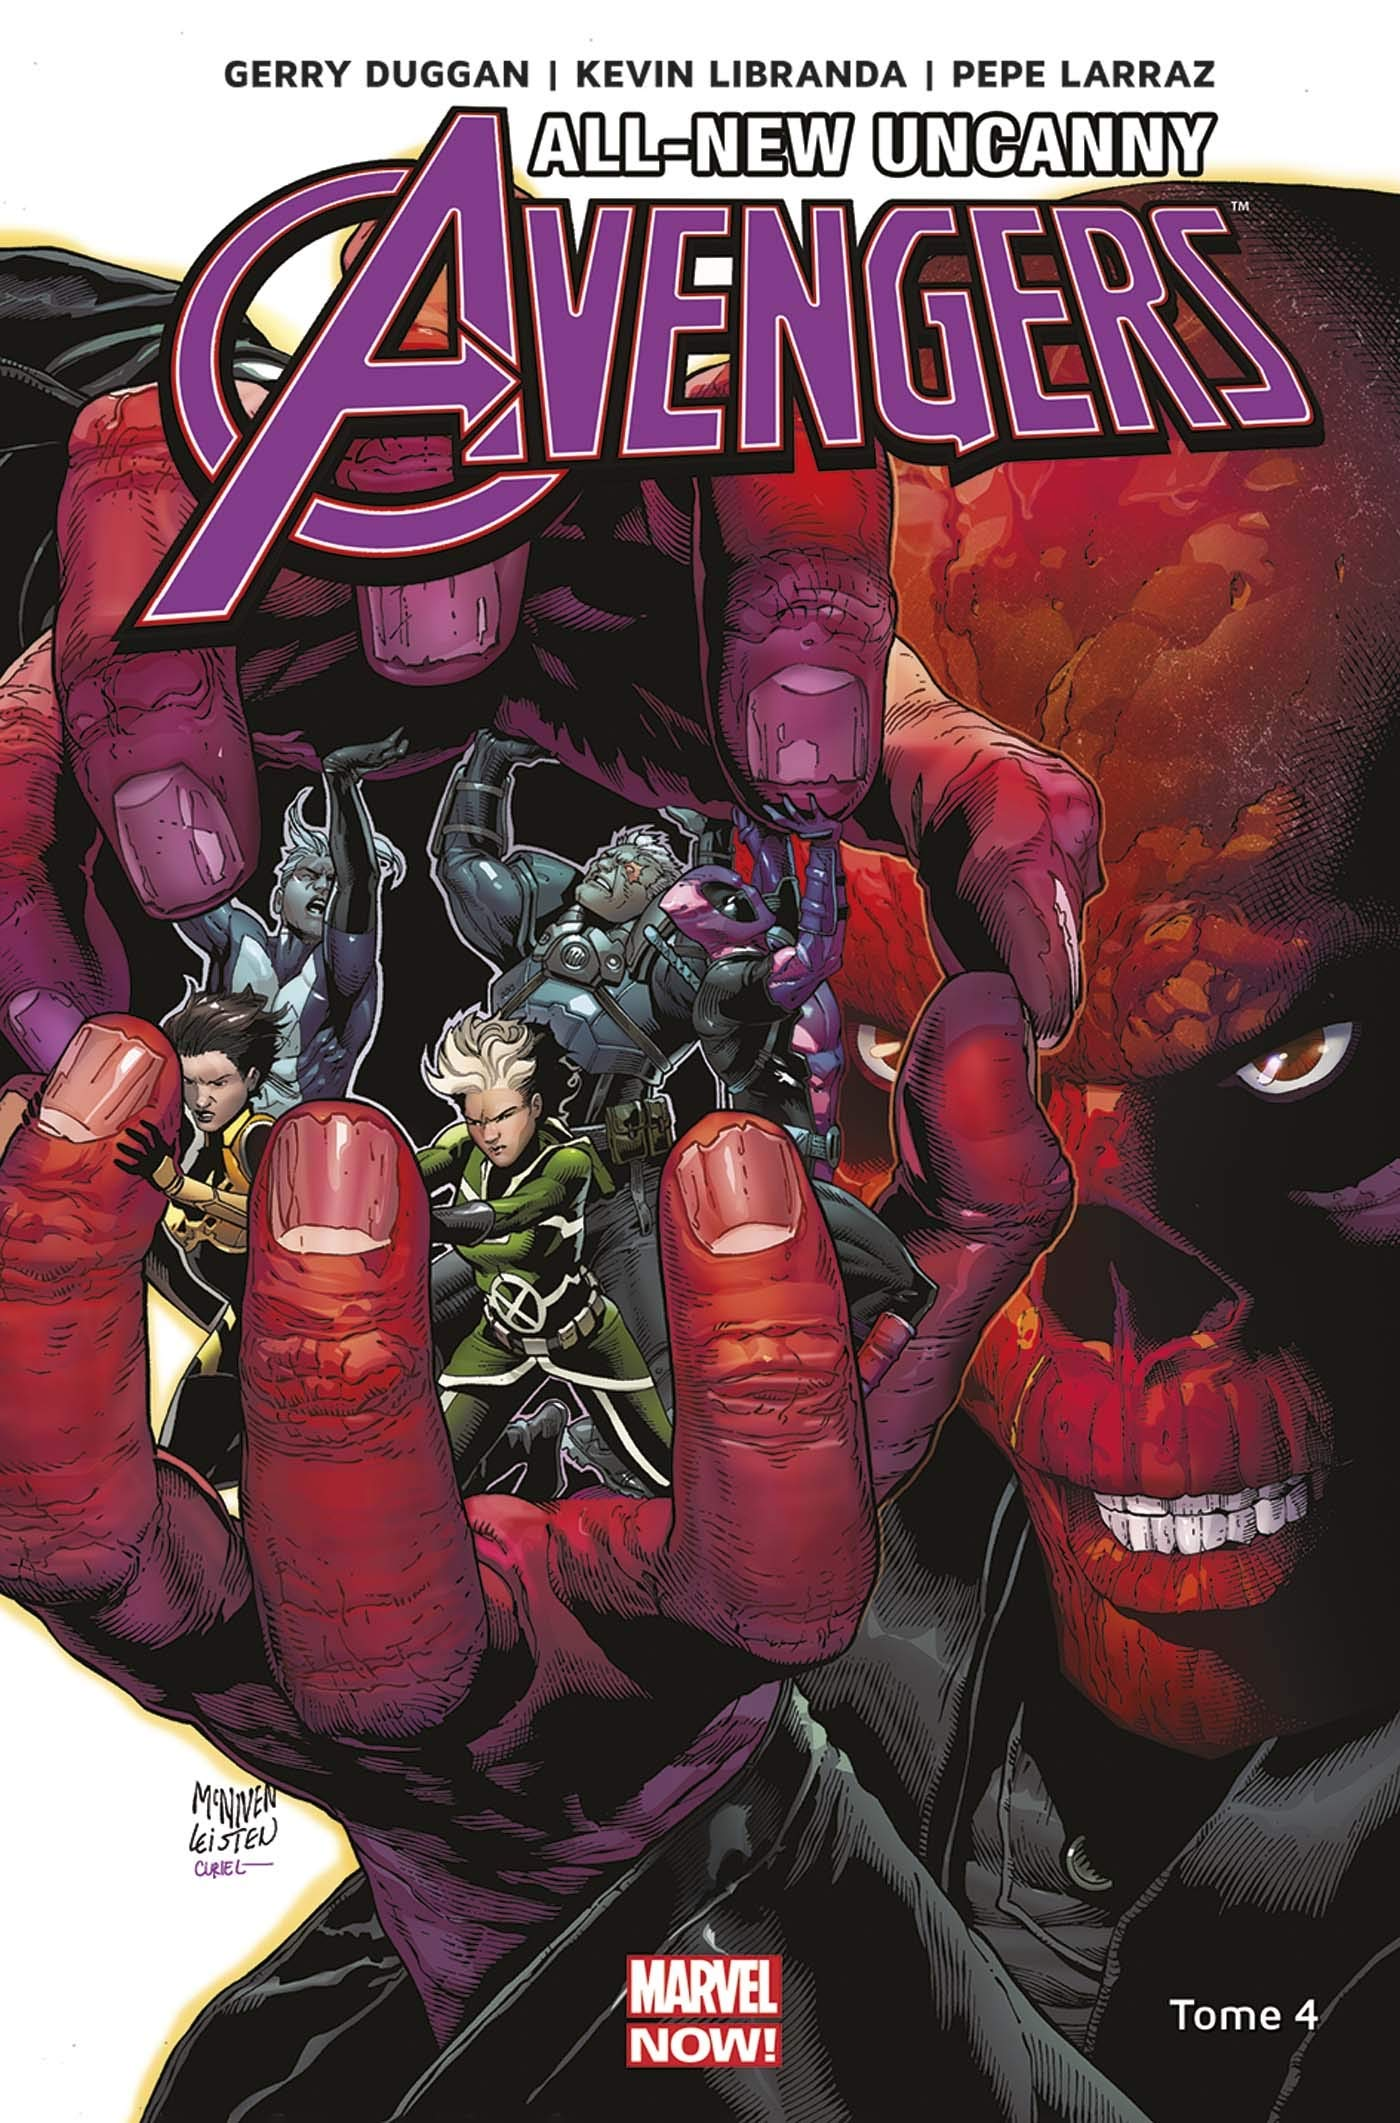 All-New Uncanny Avengers 4